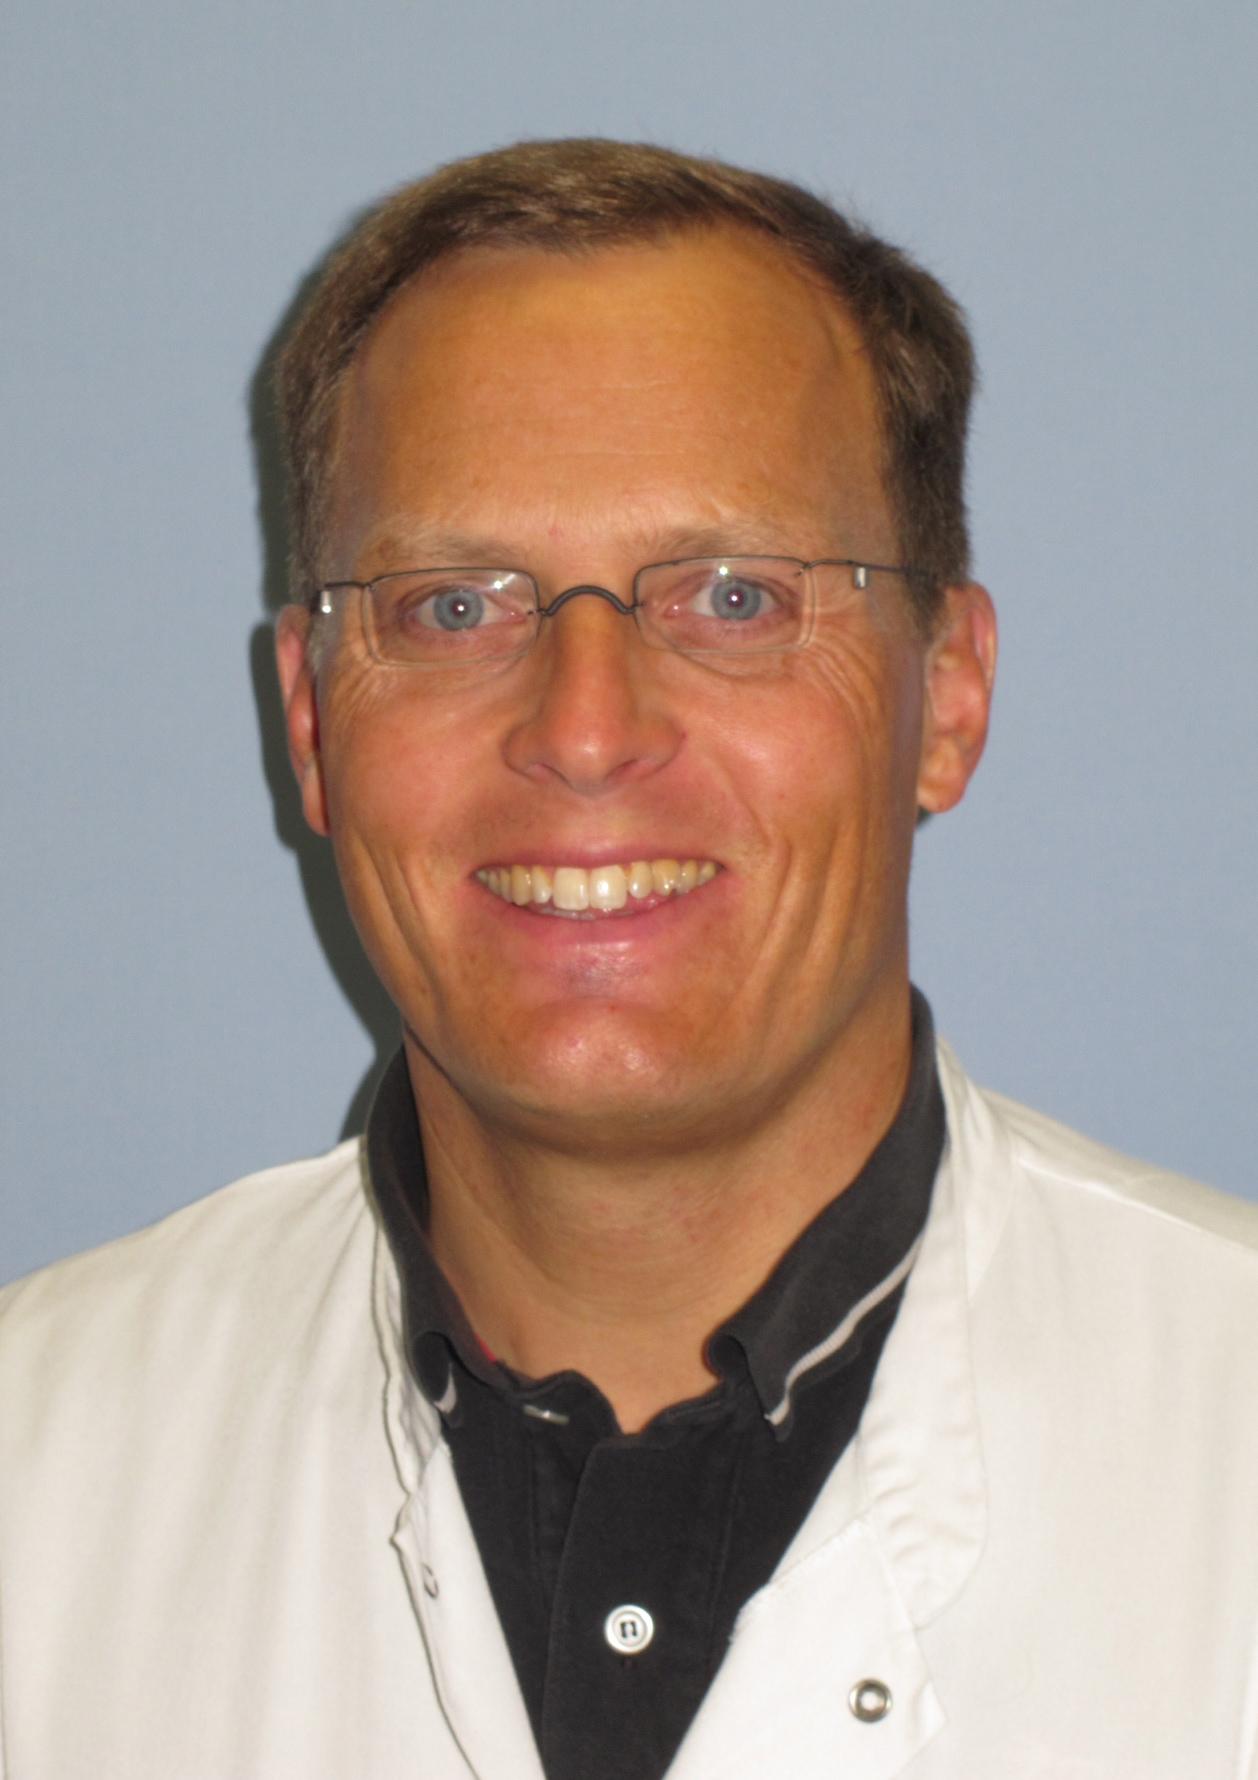 (2) OA Dr. Thomas Bauer (University Clinic in Innsbruck) eva-maria.baur@tirol-kliniken.at - Dr_Bauer1